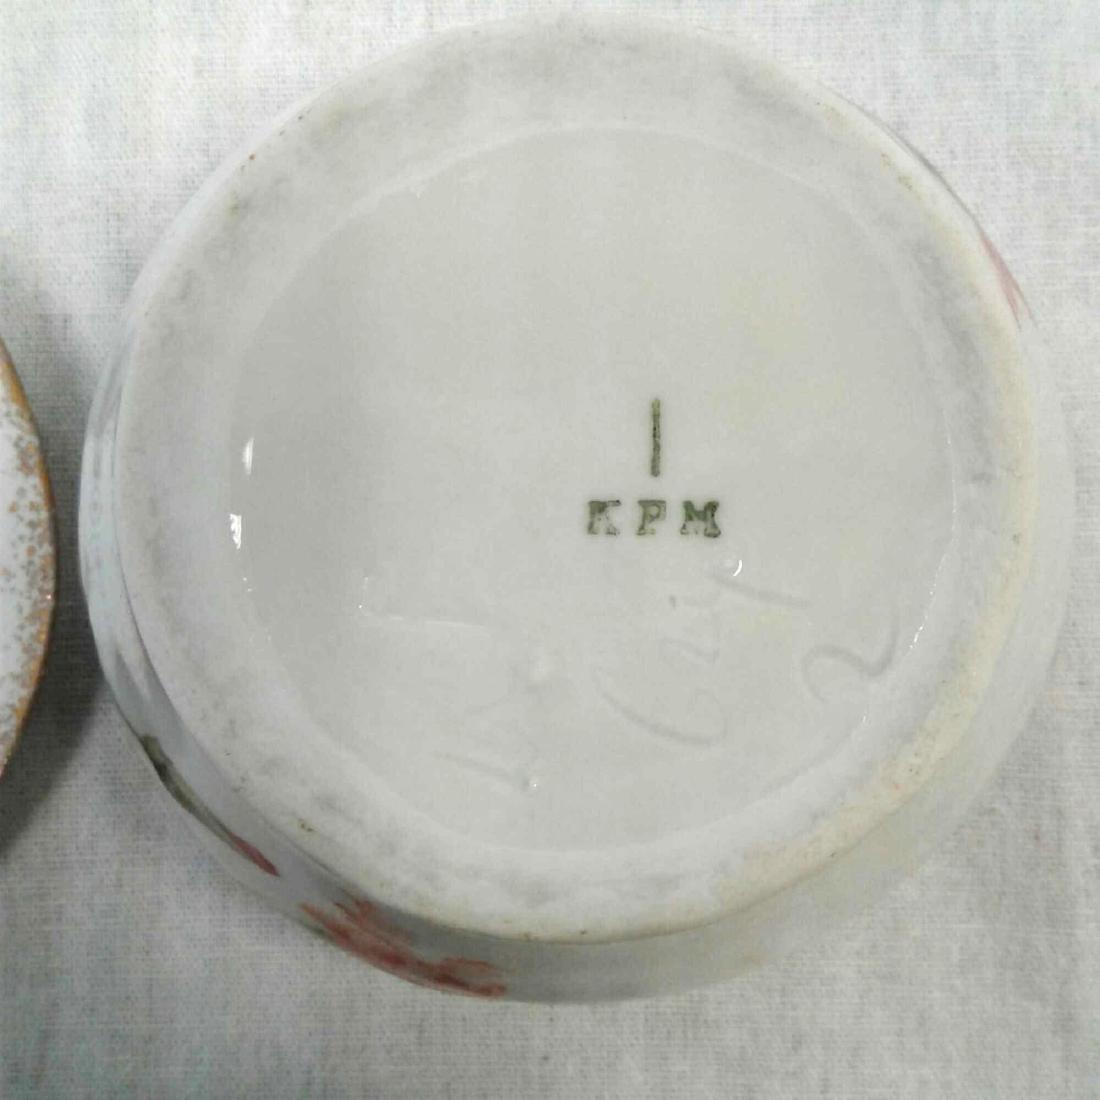 KPM Porcelain Lidded Trinket Dish - 7